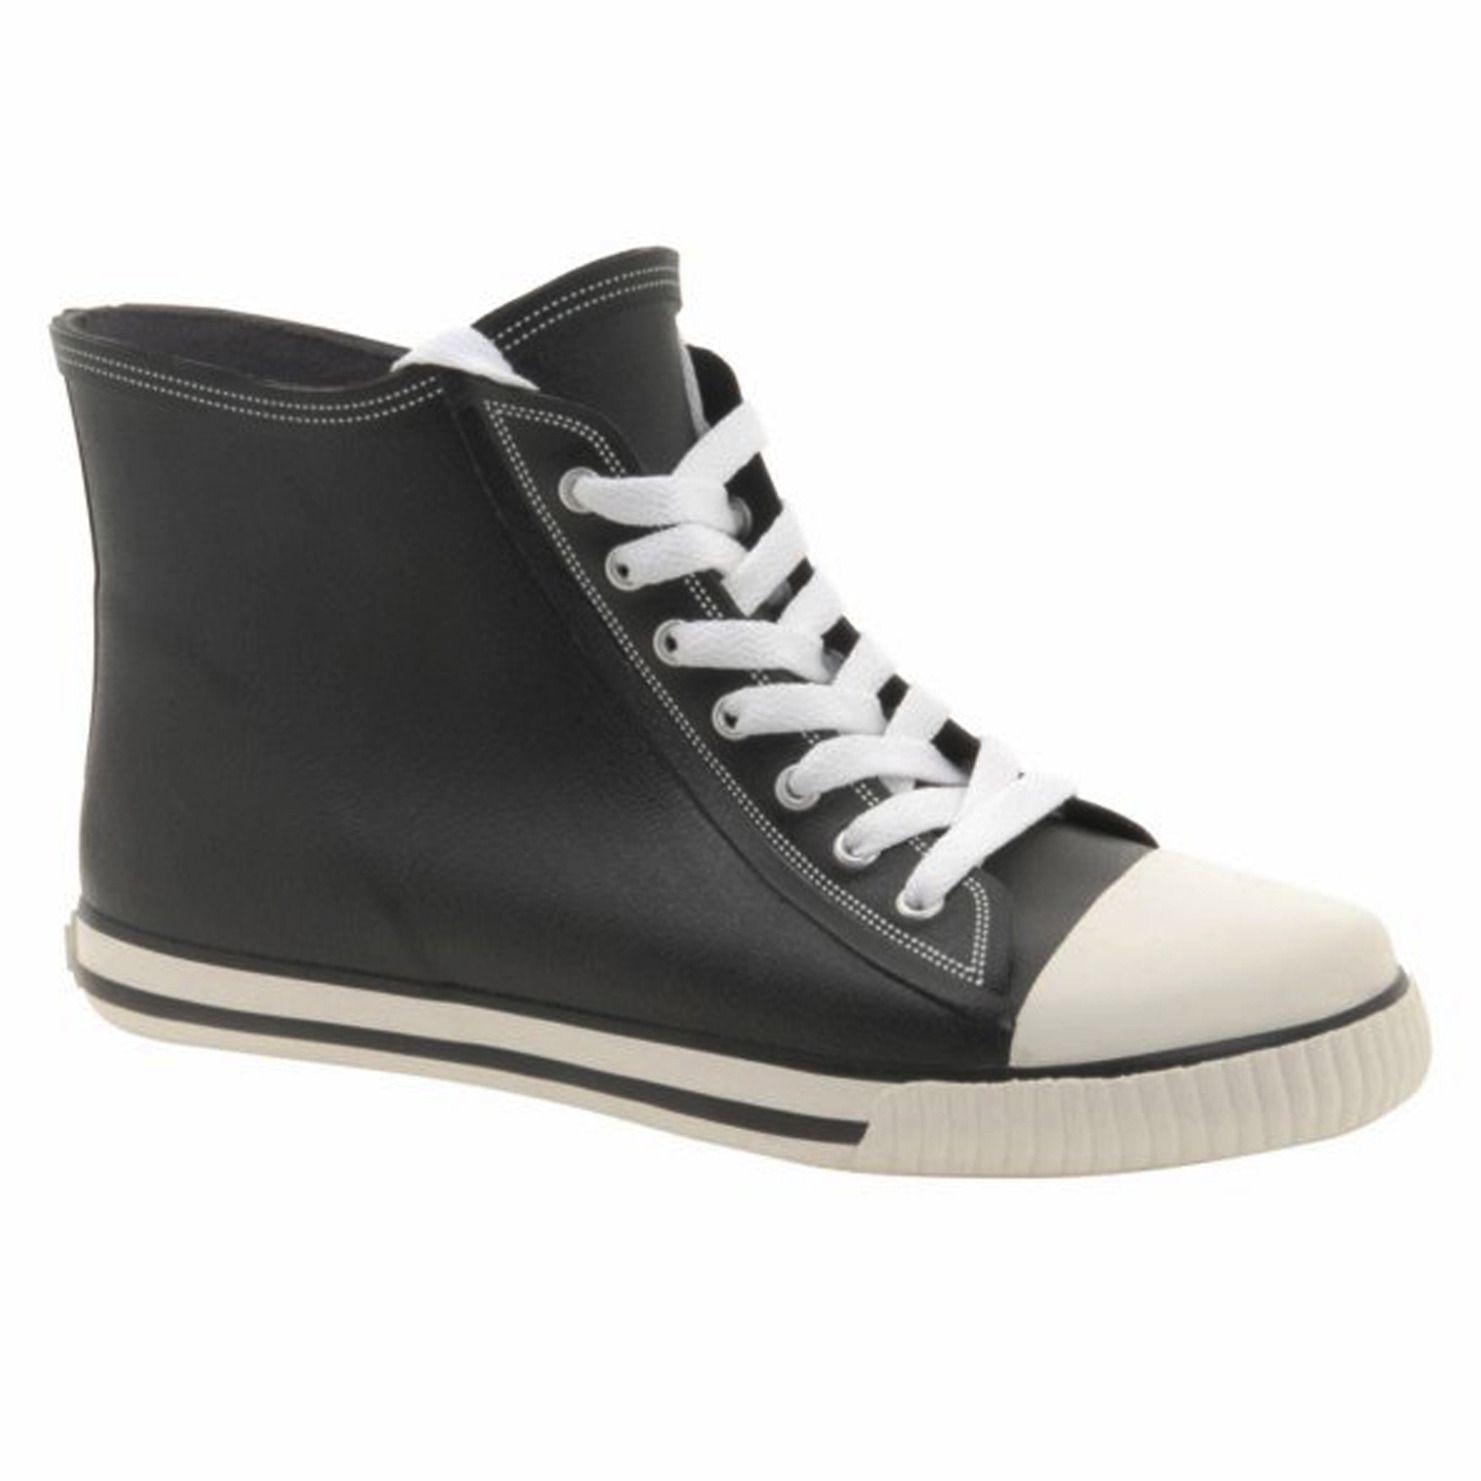 6a7ae64321f4 Low cut rain boots for Van rain city. SCARPONE - women s rain boots boots  for sale at ALDO Shoes.